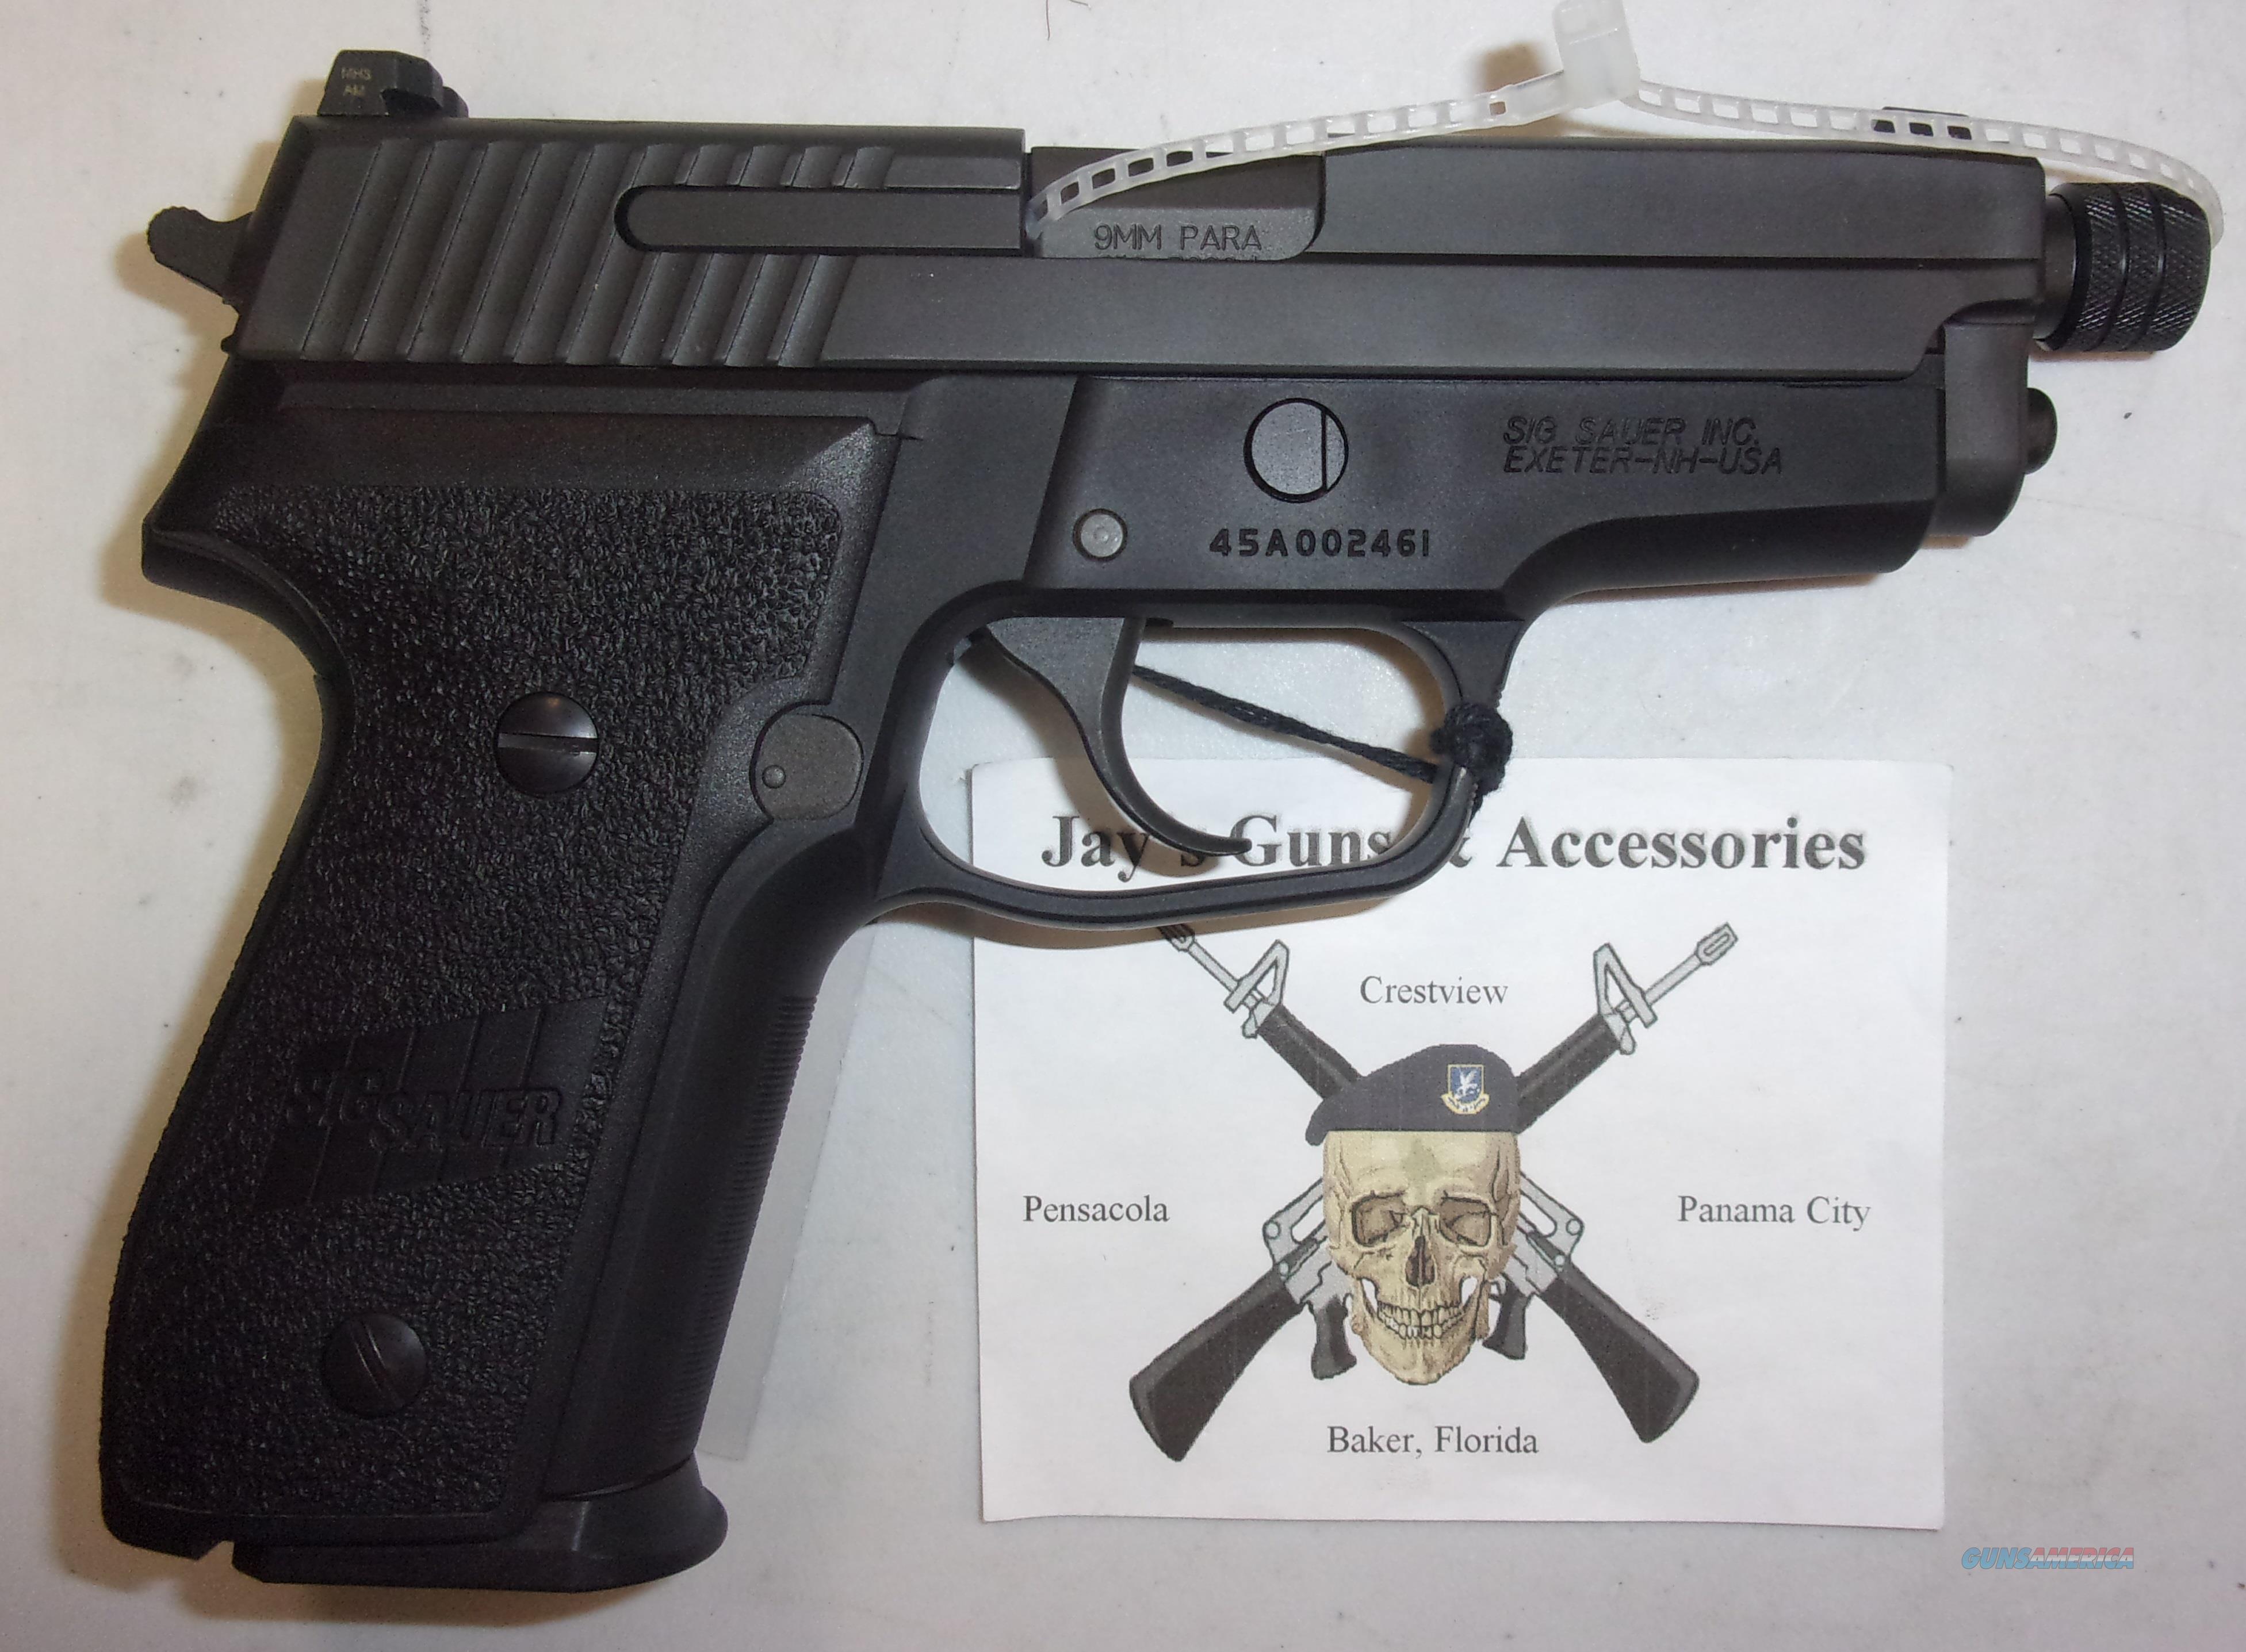 Sig Sauer M11-A1 (M11-A1-TB)  Guns > Pistols > Sig - Sauer/Sigarms Pistols > 1911